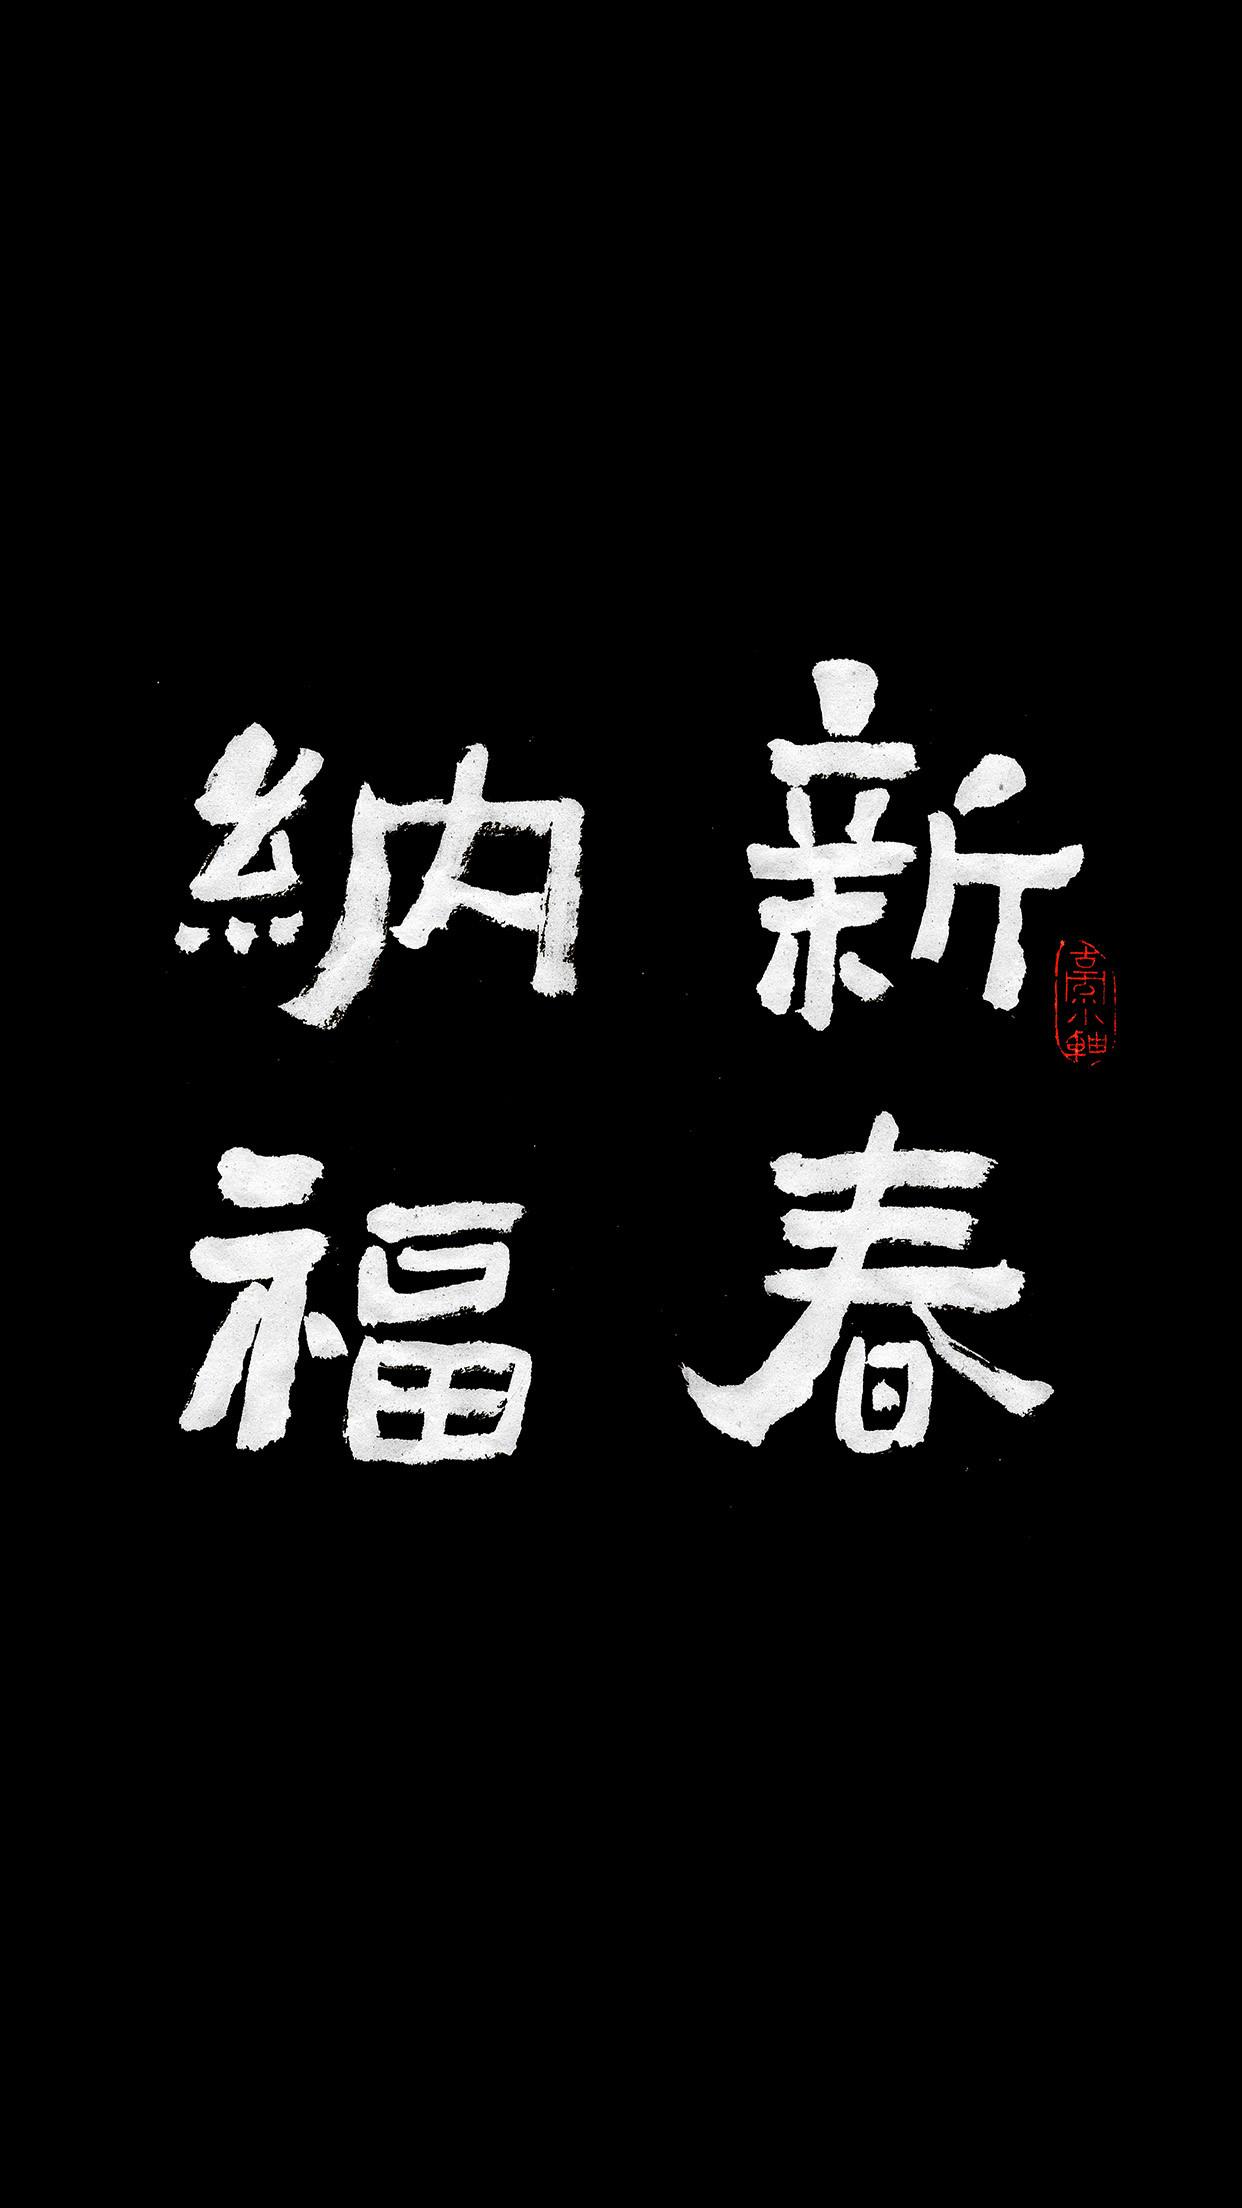 3333x1730 Chinese New Year 2016 Wallpaper